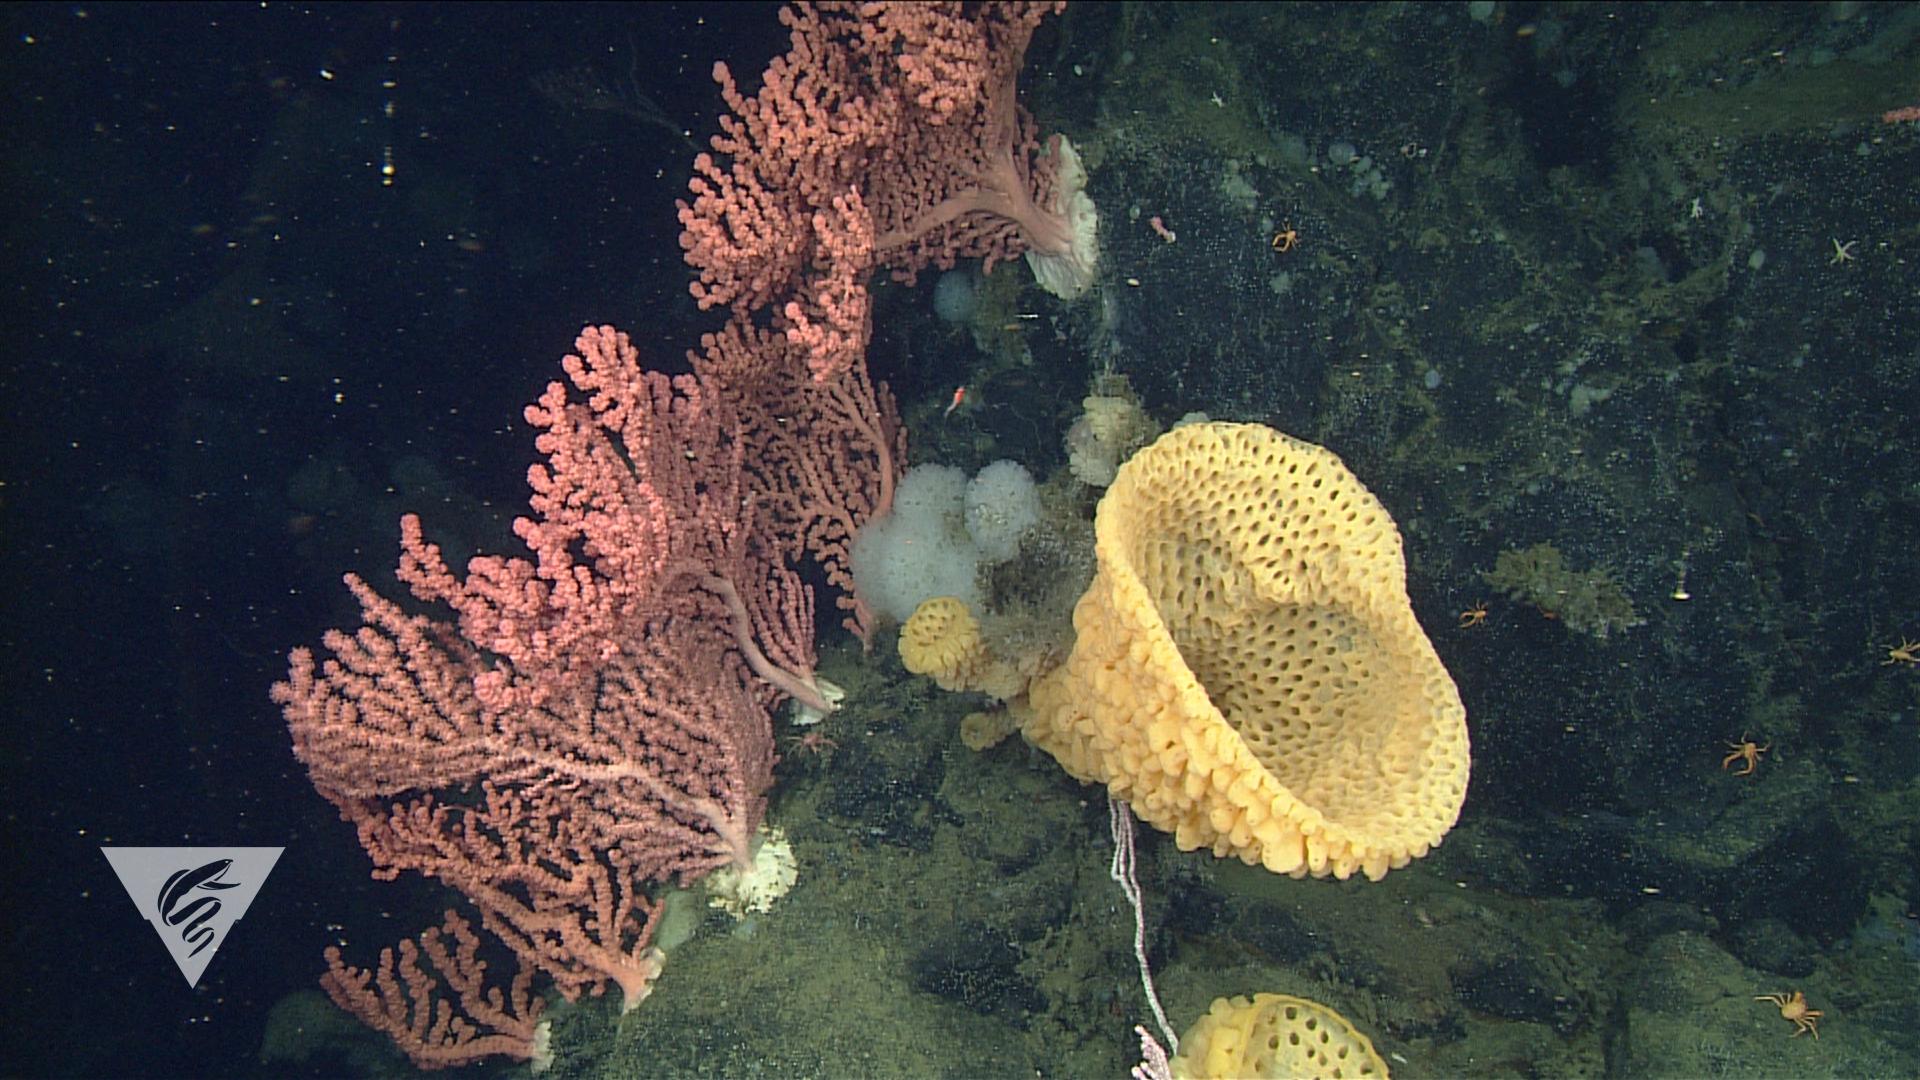 Bubblegum corals and goiter sponges